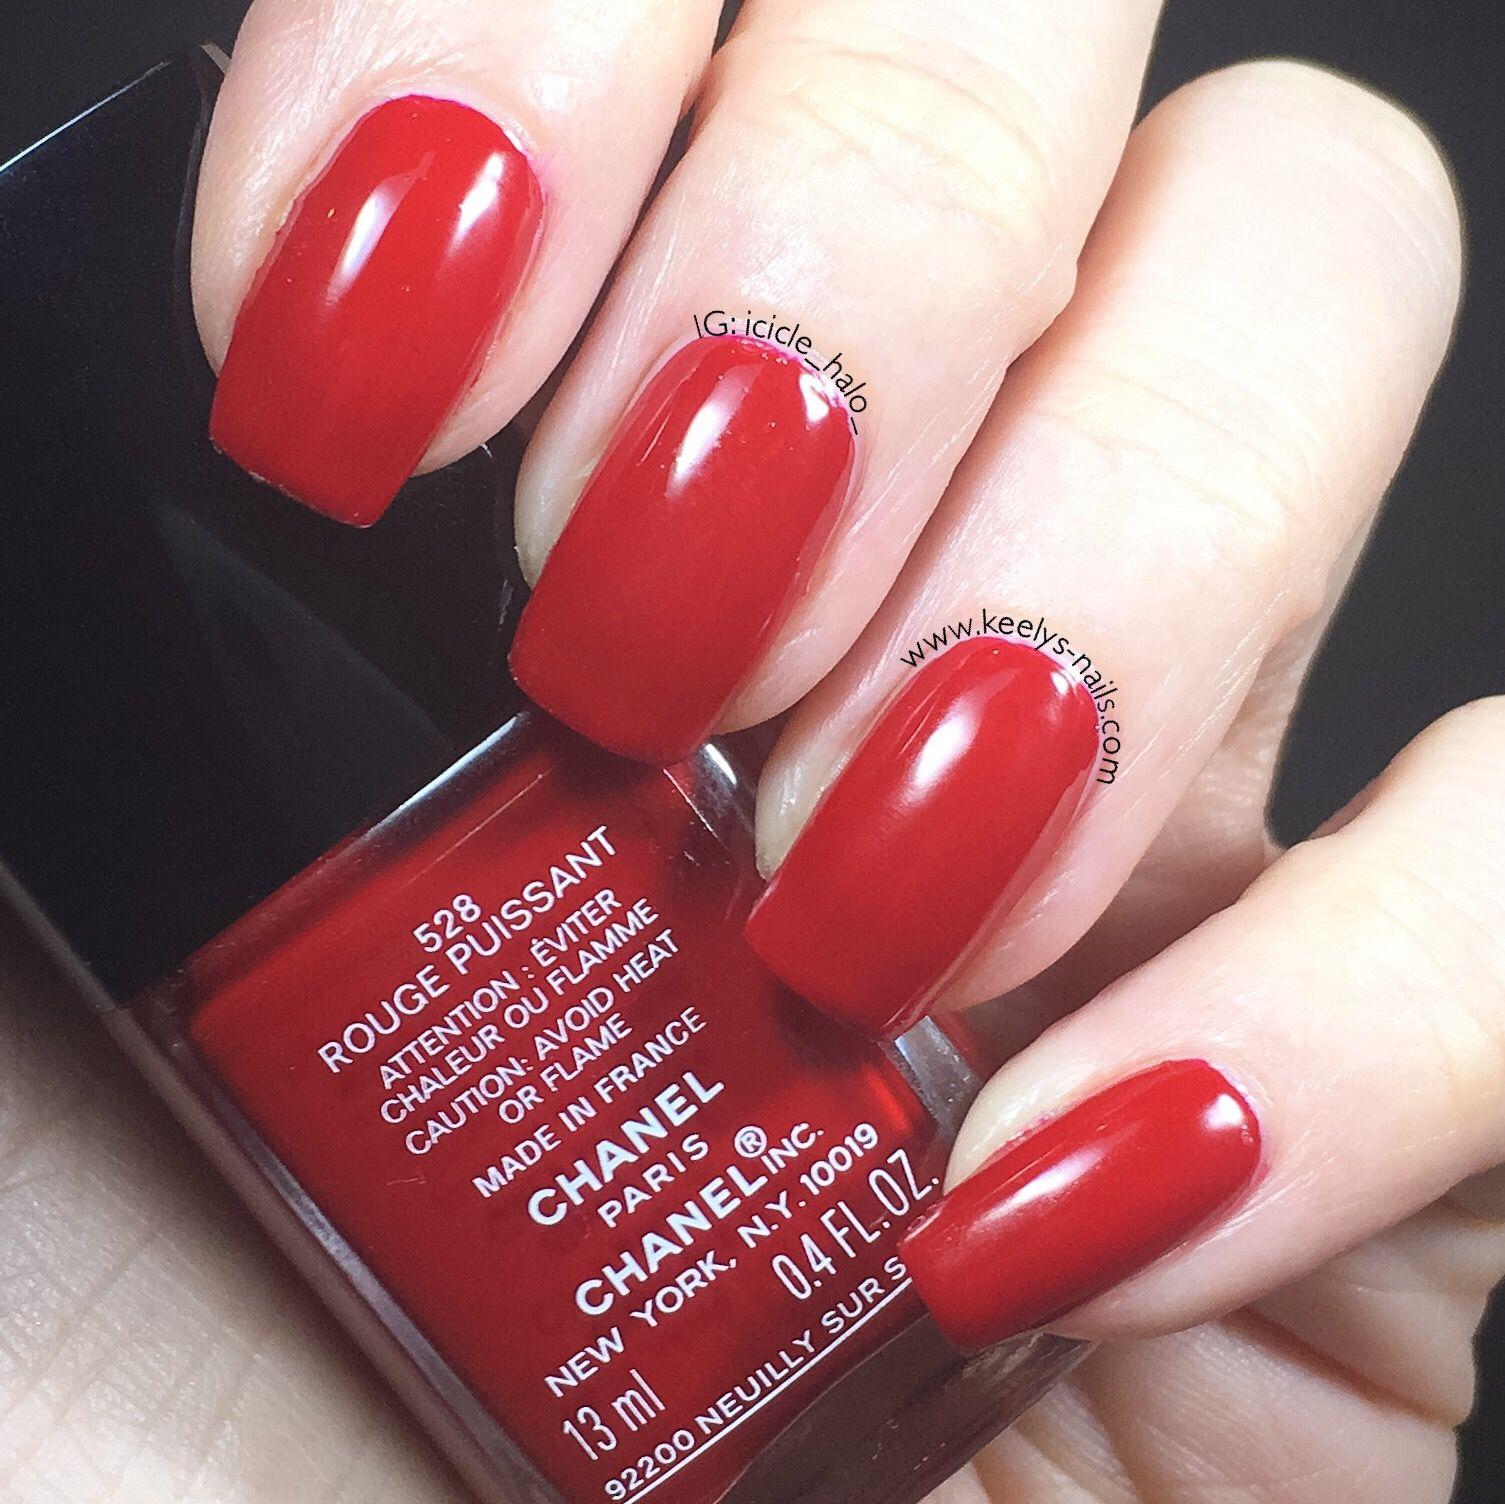 Chanel Nail Polish Fall 2016 Swatches Keely S Nails Neon Nail Polish Neon Nails Nail Polish